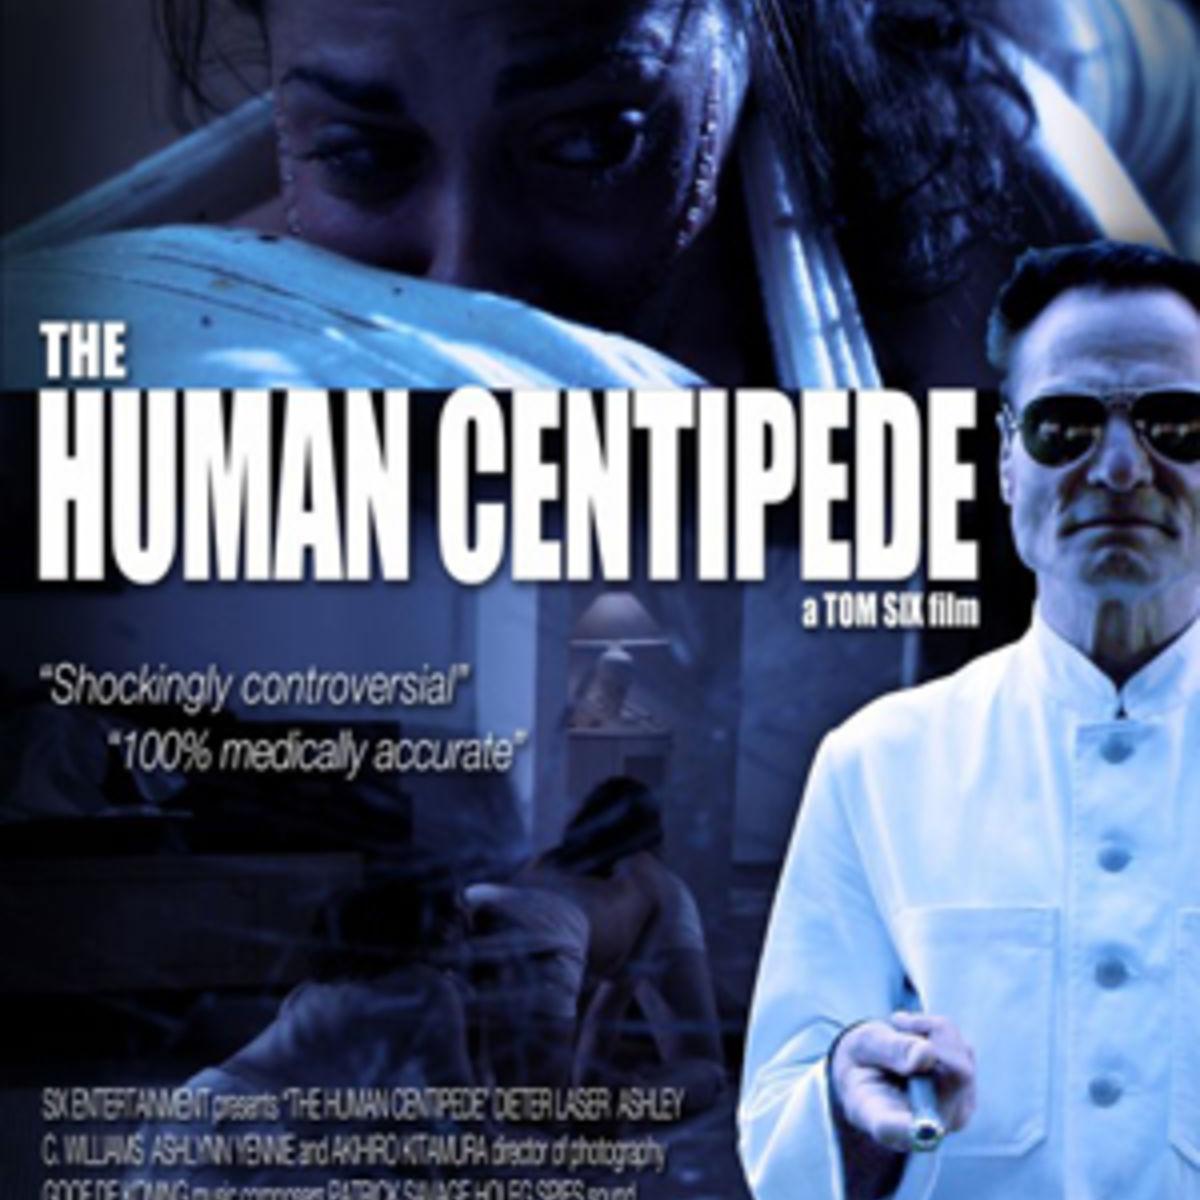 HumanCentipedeReview1.jpg